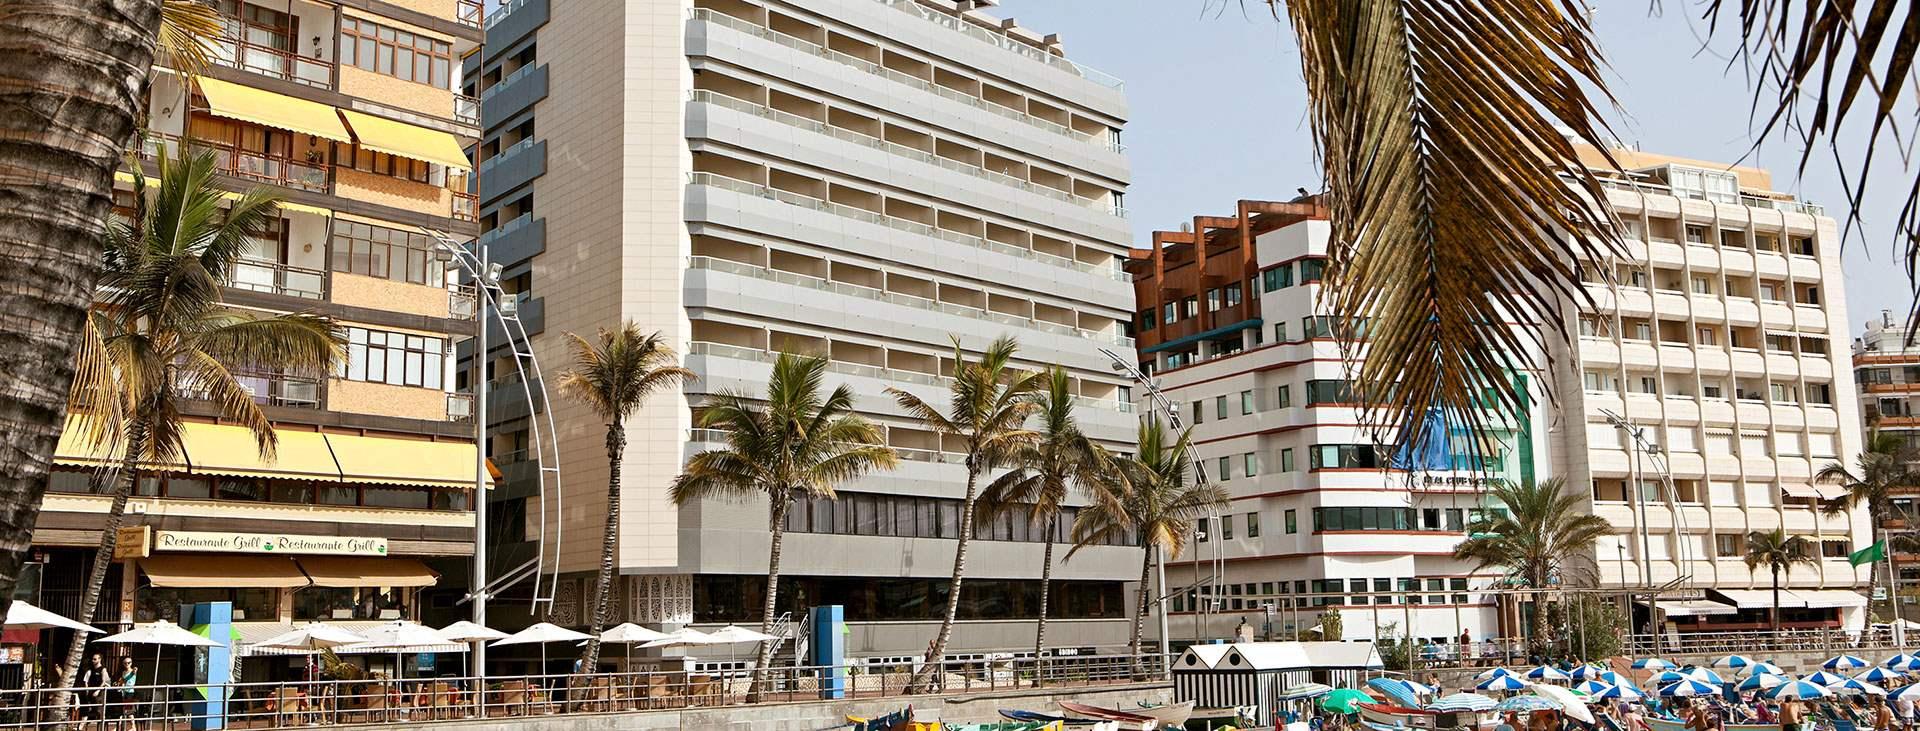 Hotelli Nh Imperial Playa Las Palmas Tjareborg